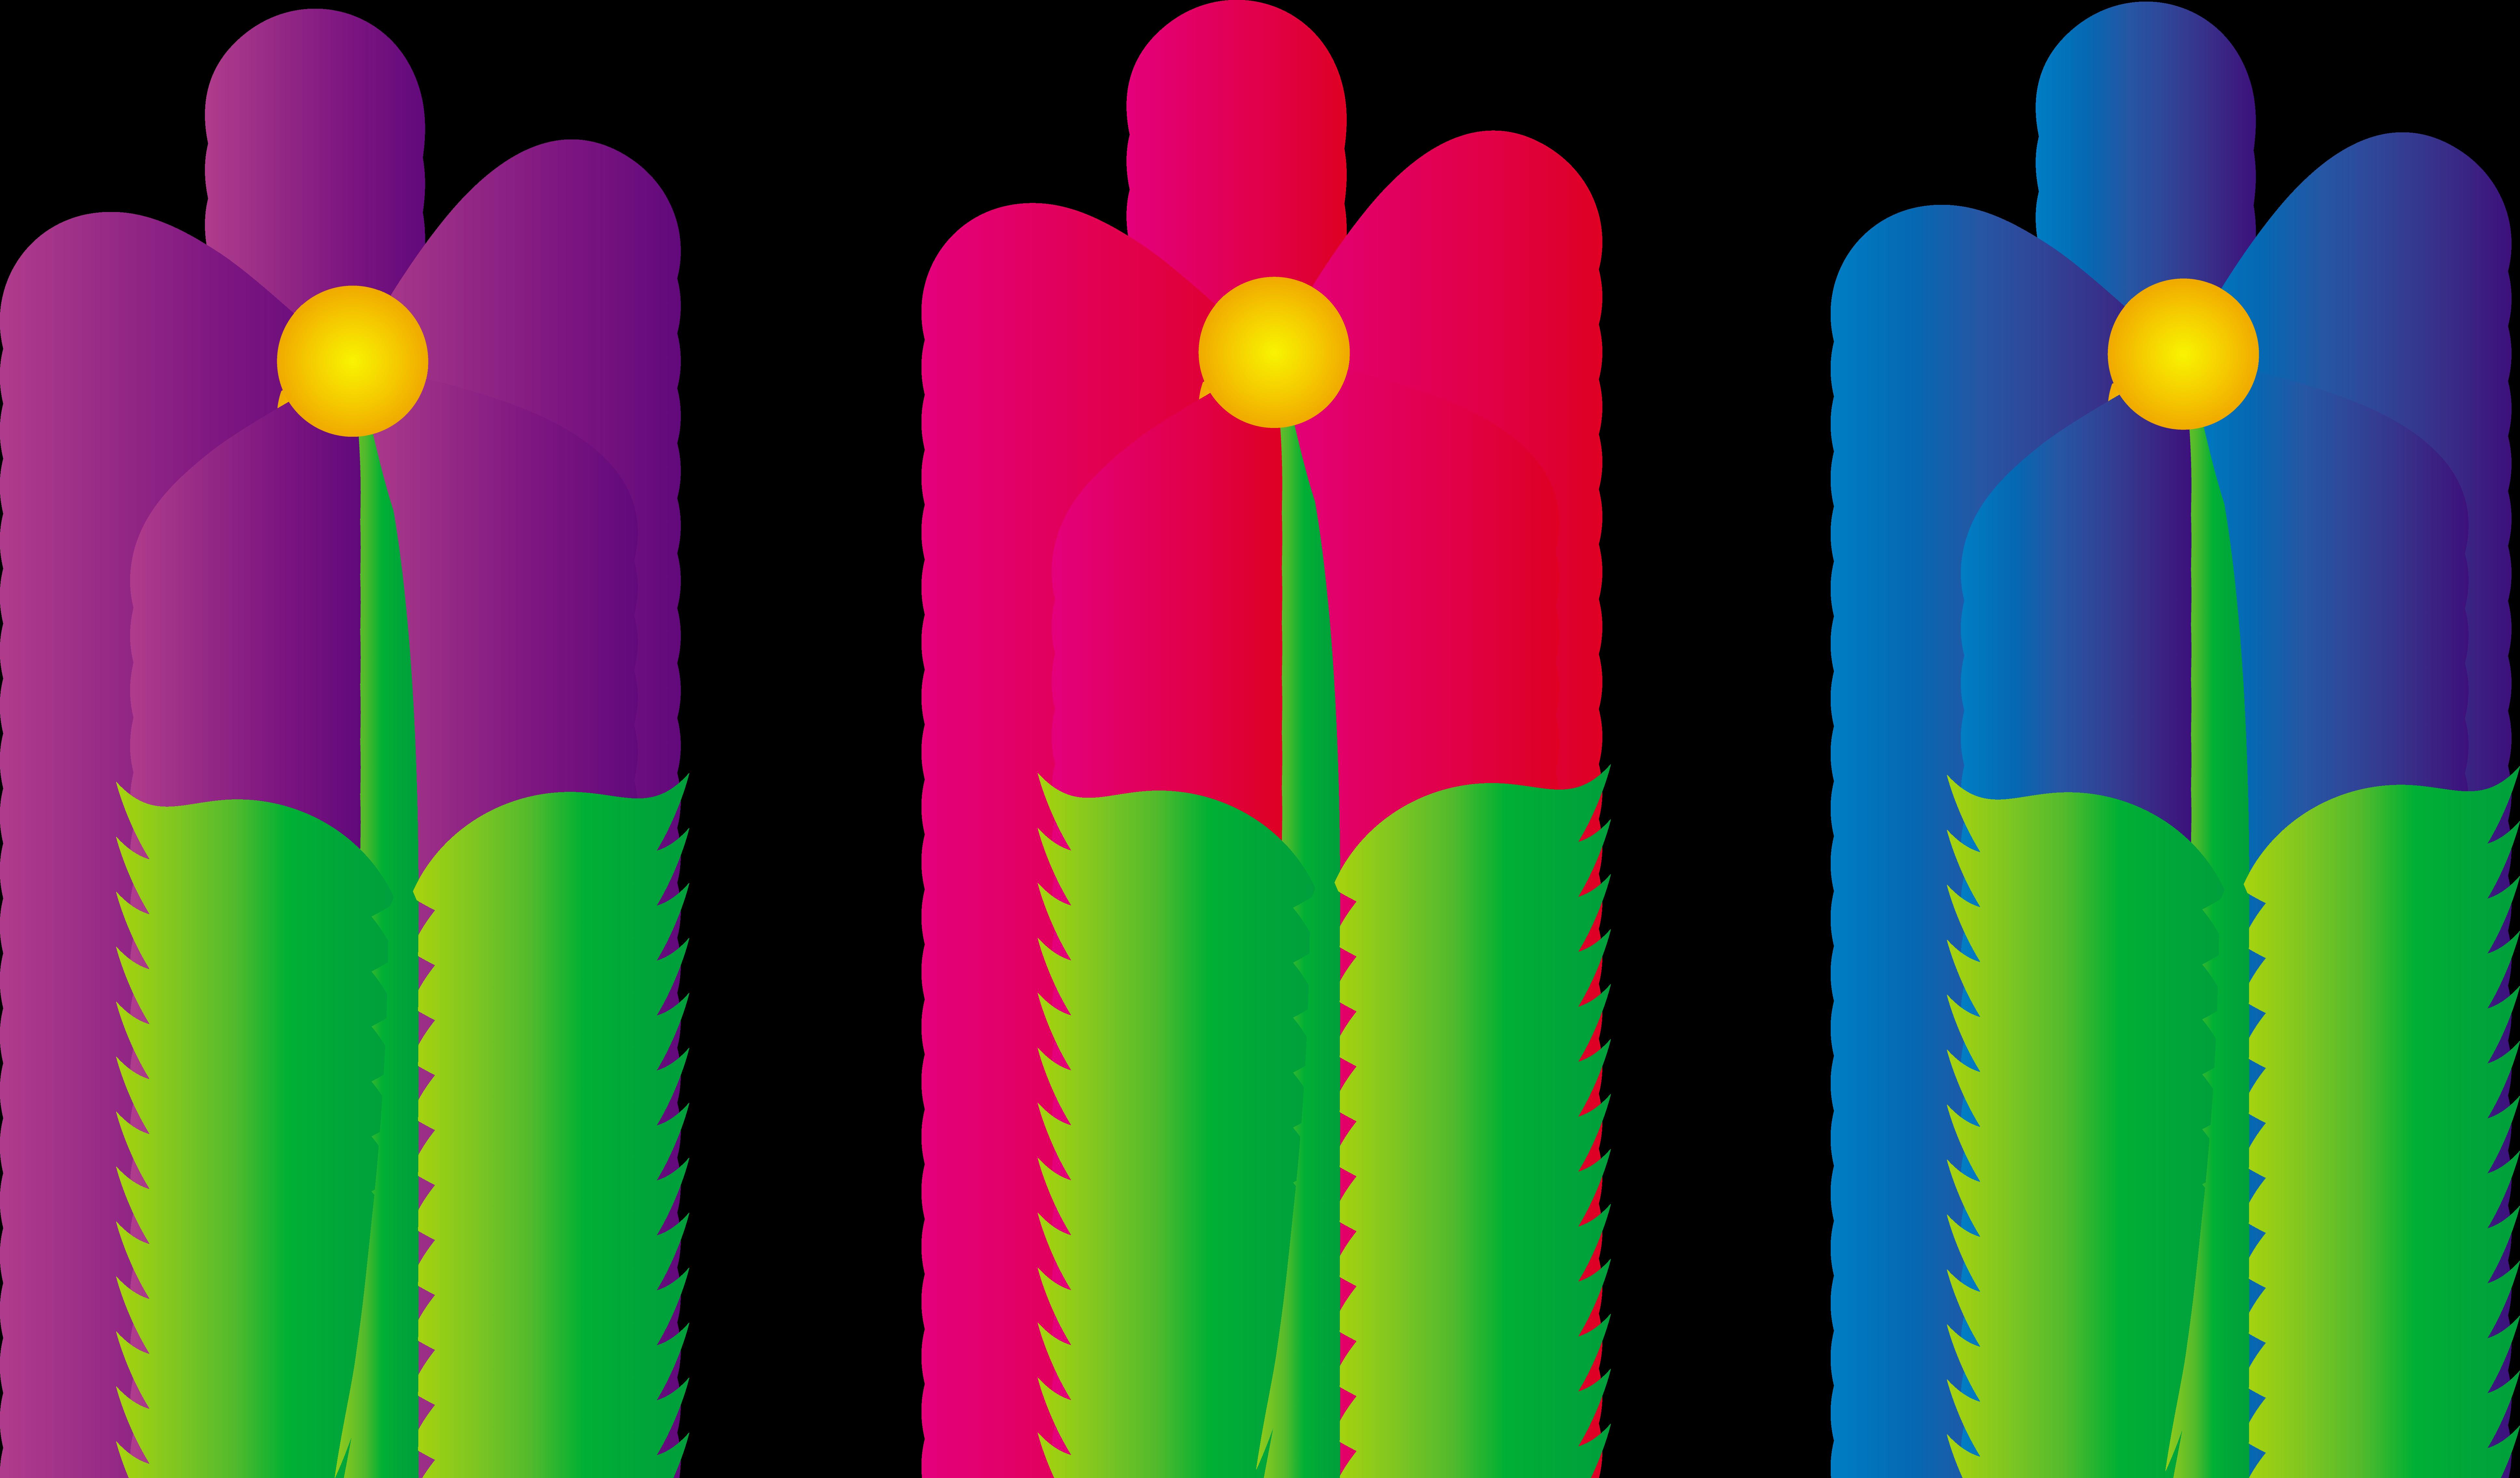 7747x4545 Adorable Clip Art Three Colorful Daisies